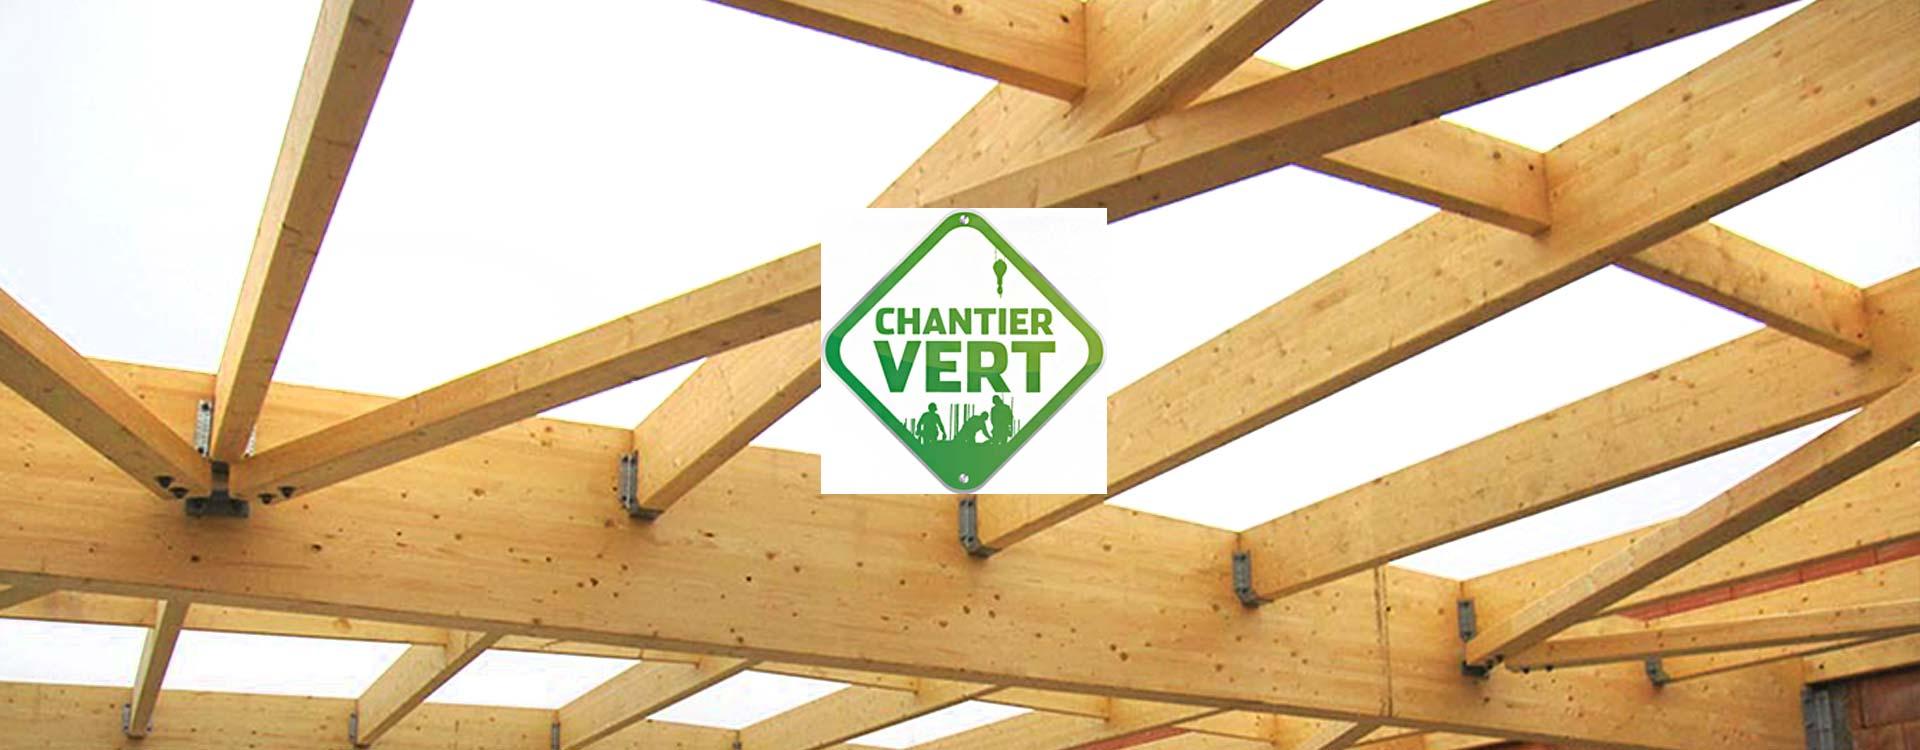 Charte chantier vert Menuiserie Moro et Fils Andilly Val d'Oise 95